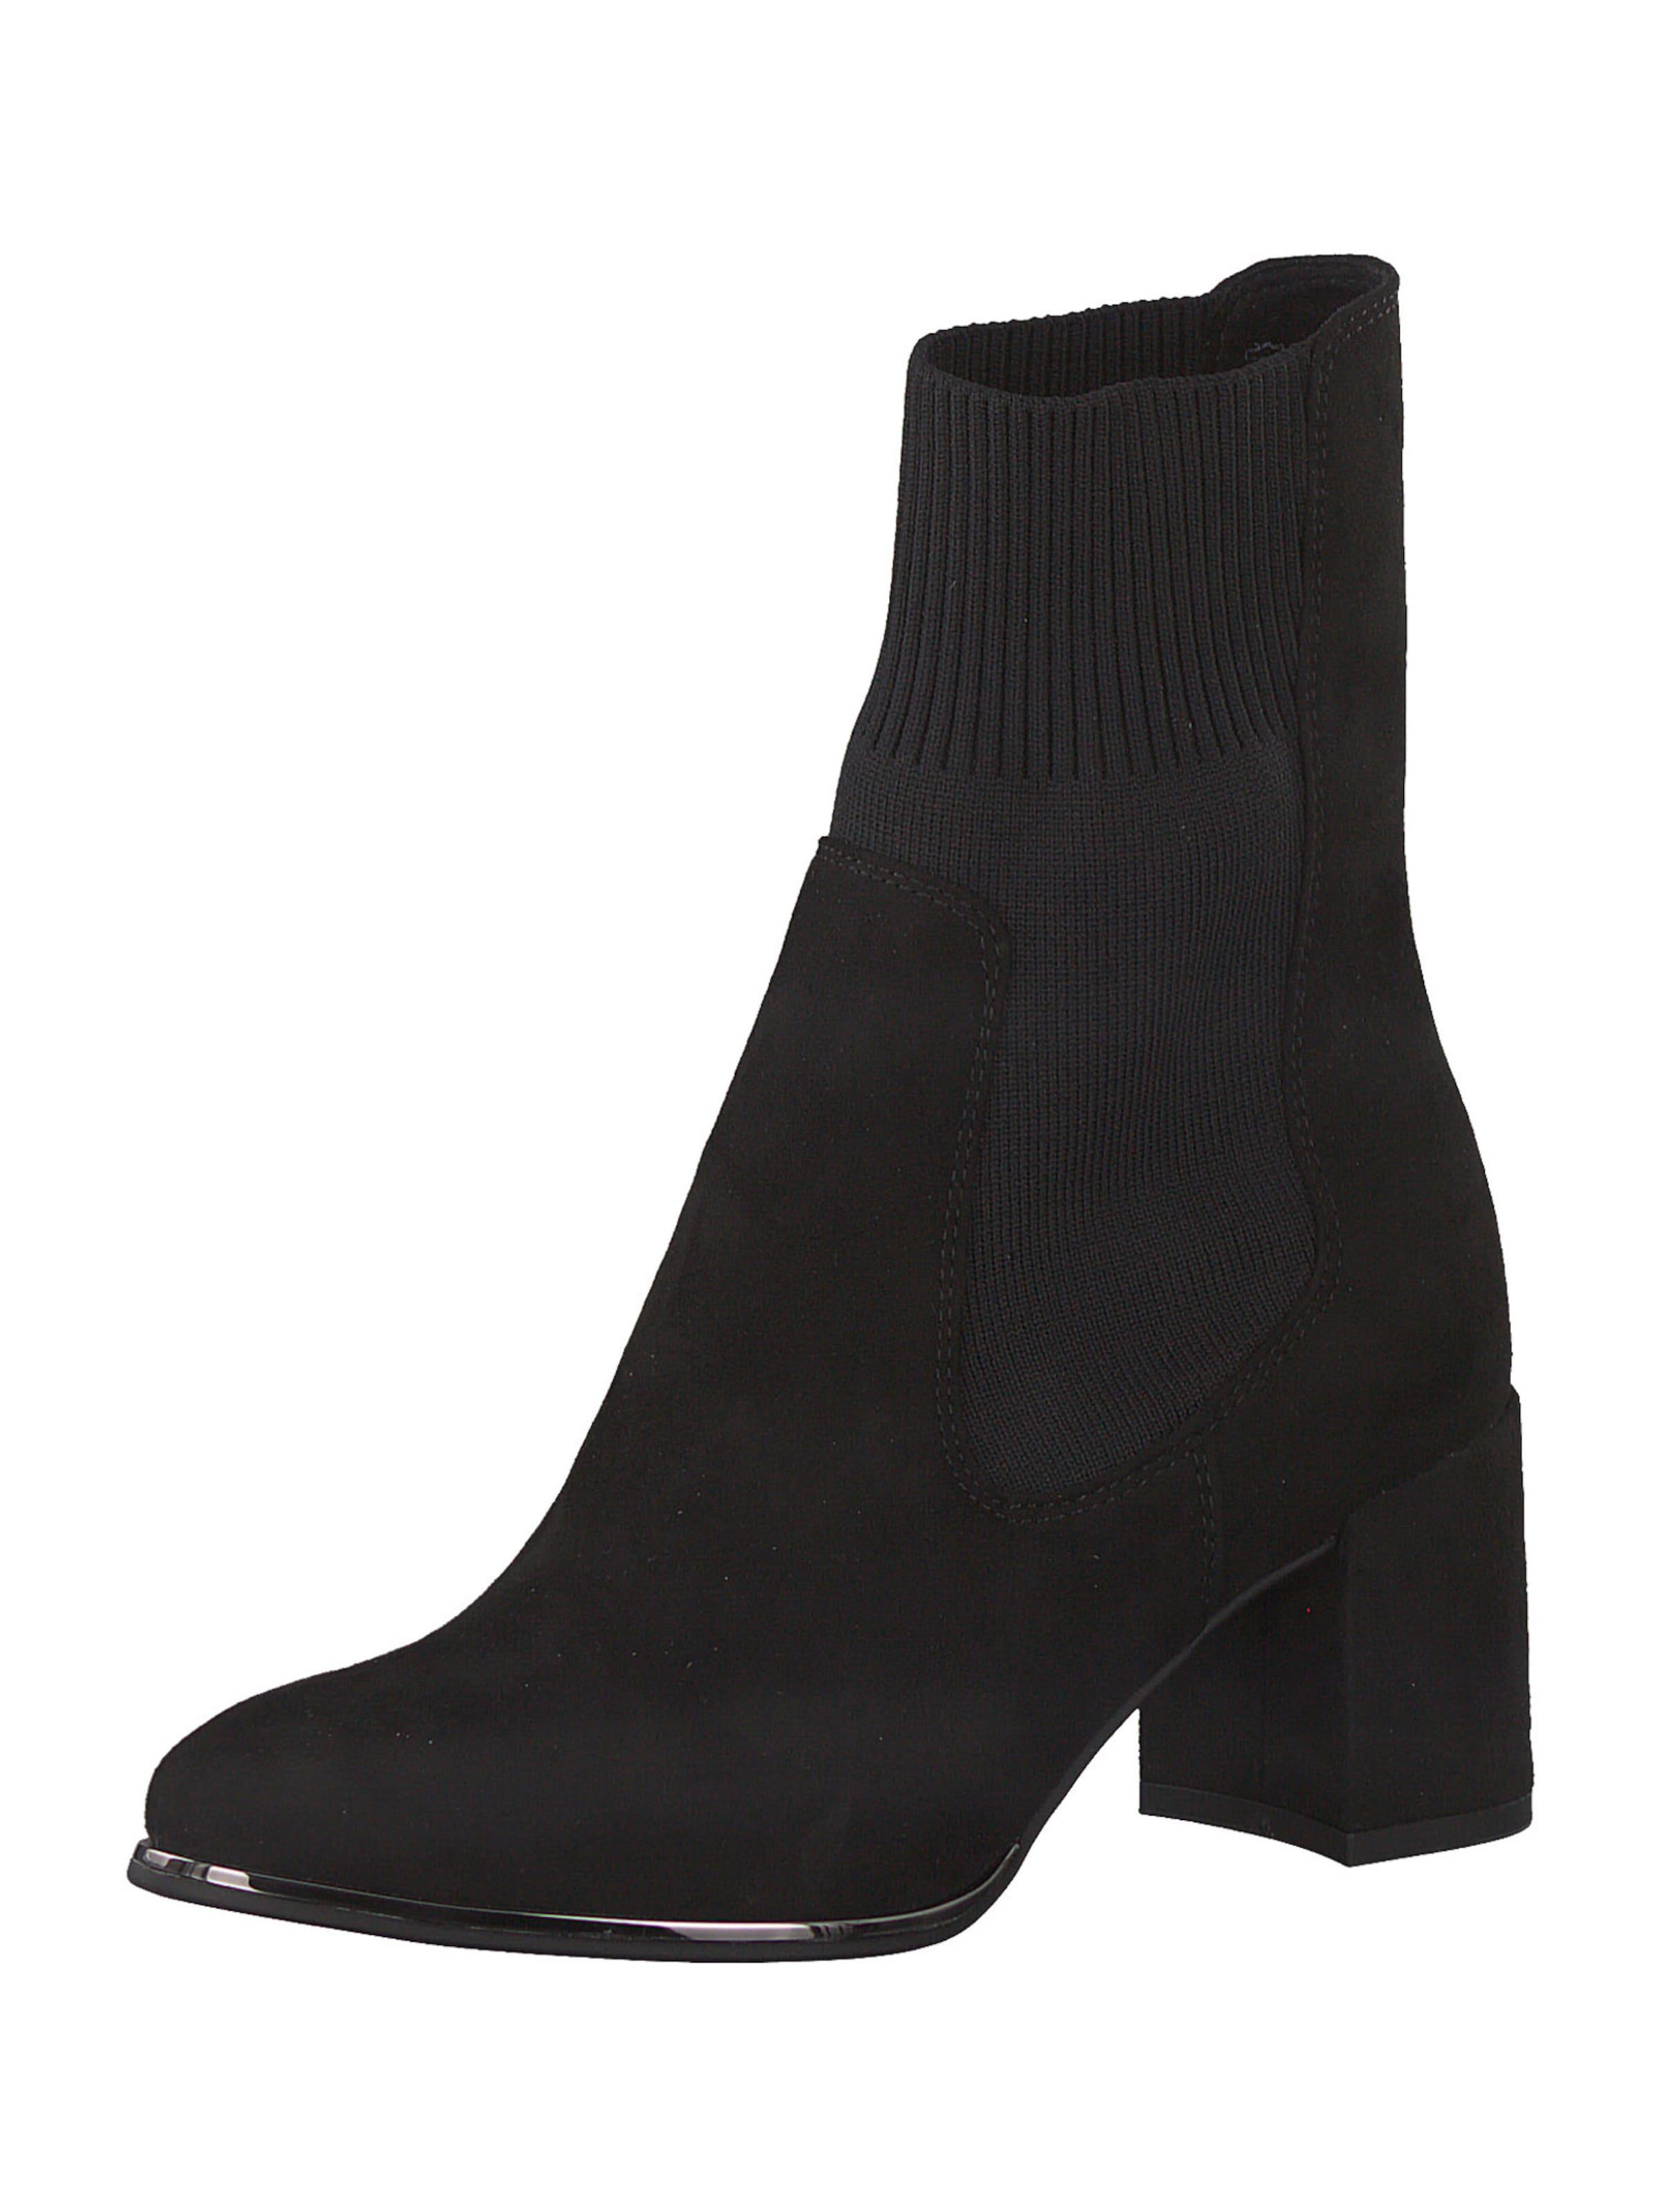 MARCO TOZZI Chelsea boots i svart